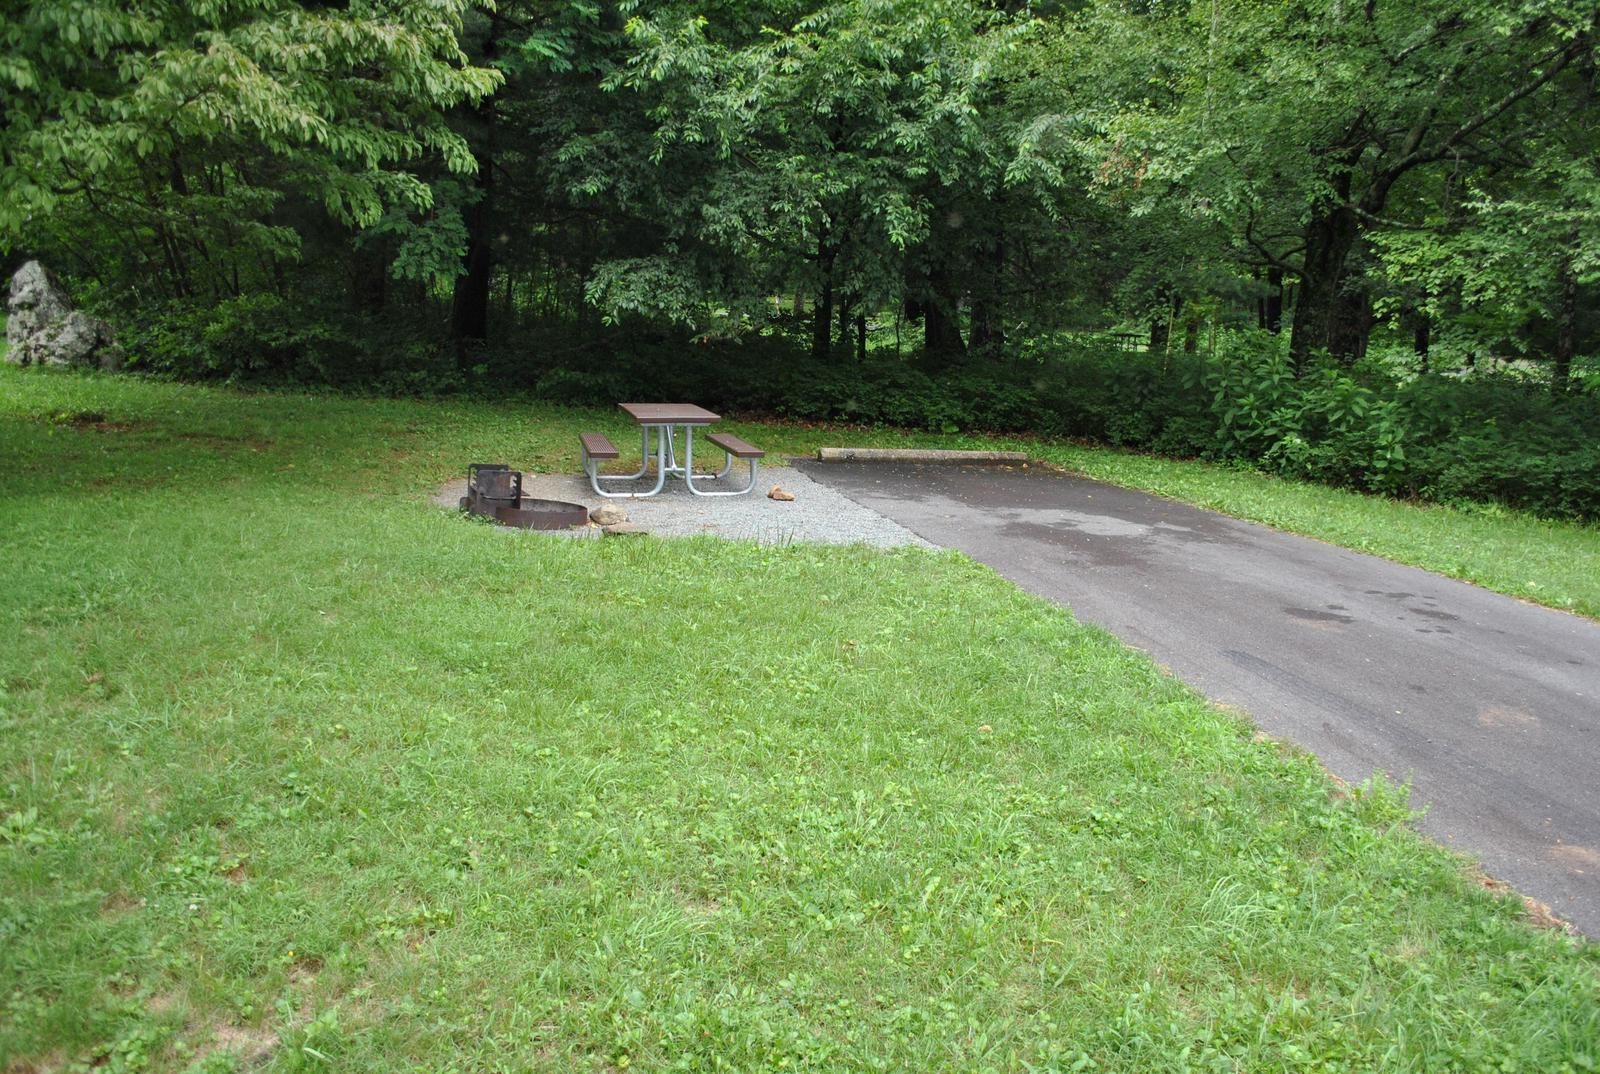 Mathews Arm Campground – Site A101